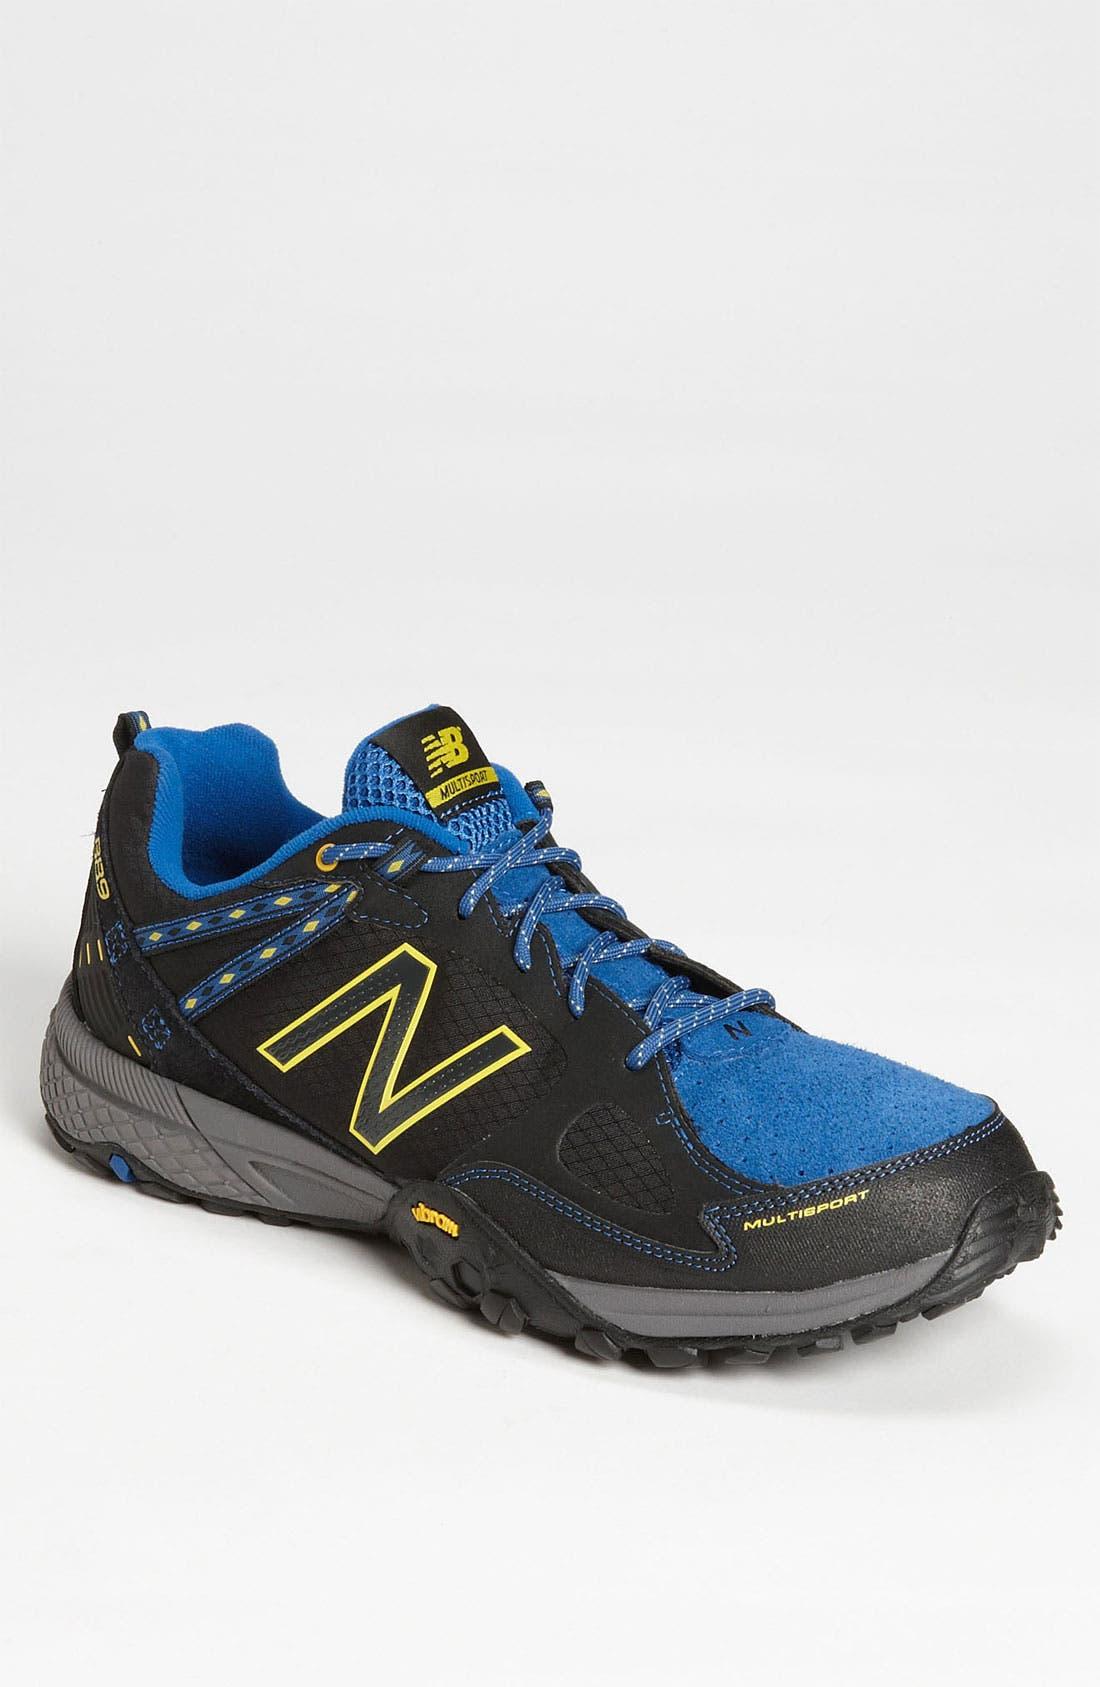 Alternate Image 1 Selected - New Balance '889' Trail Running Shoe (Men)